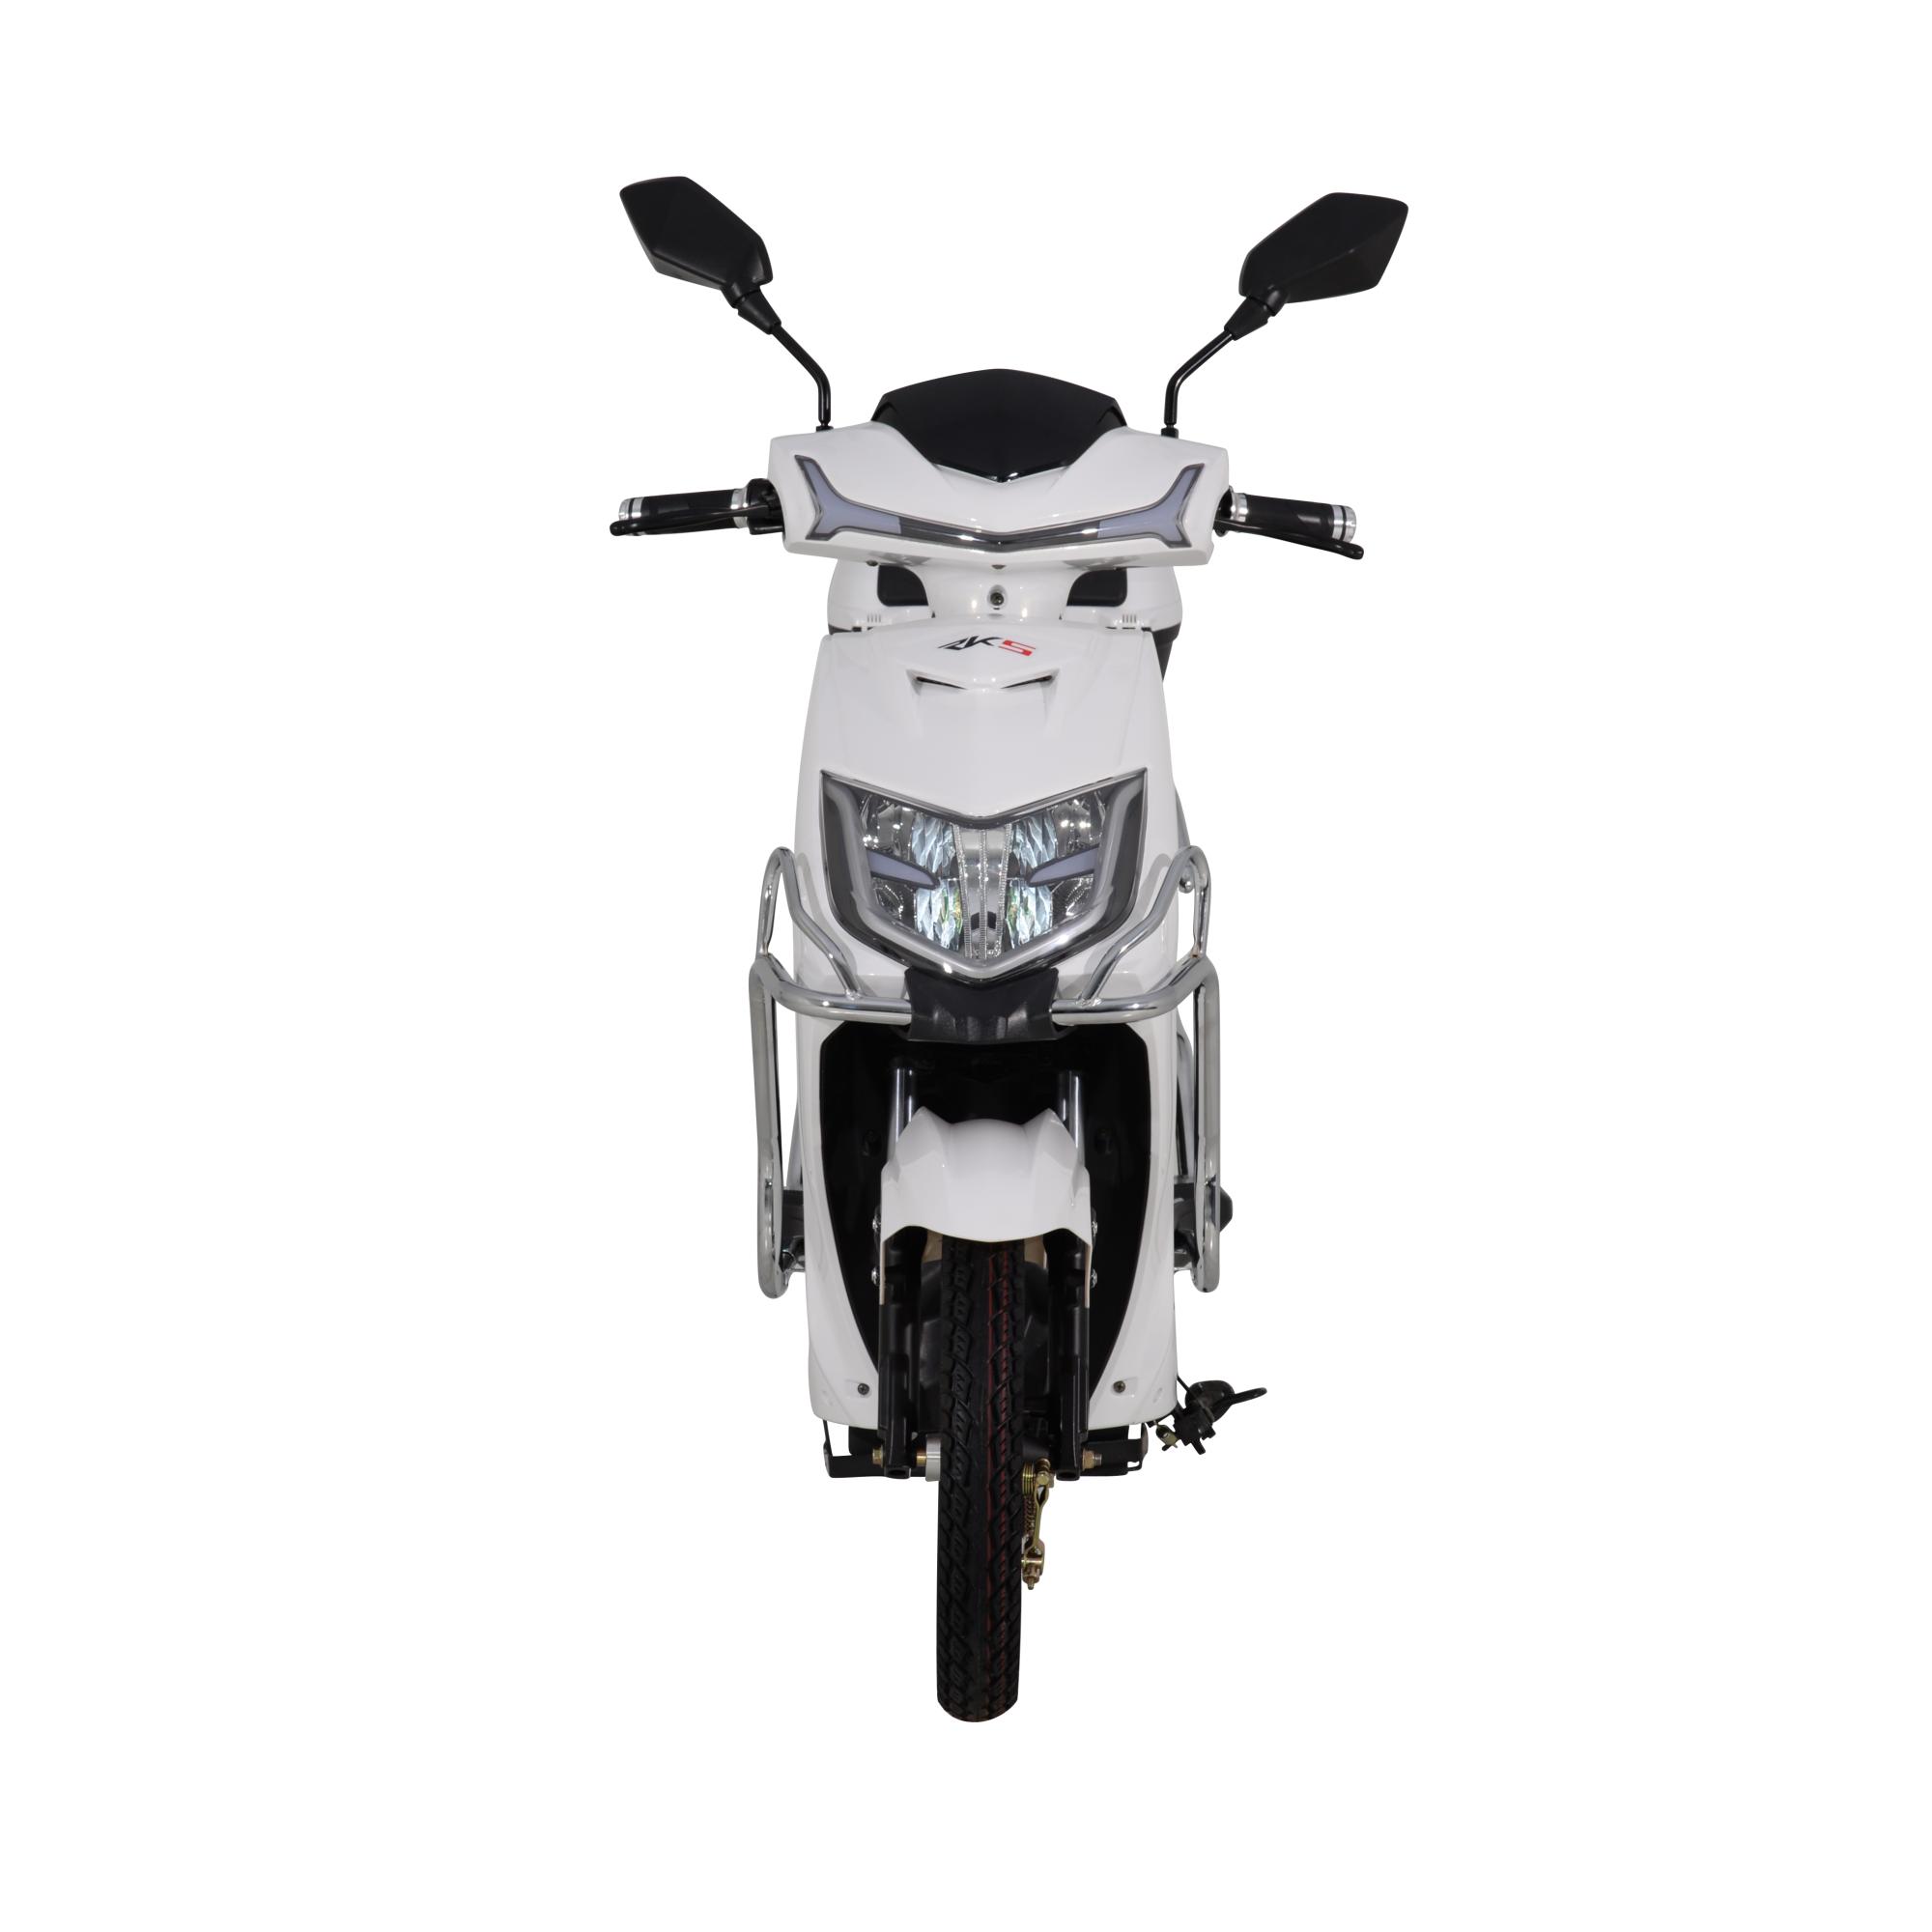 Eco Rider MX